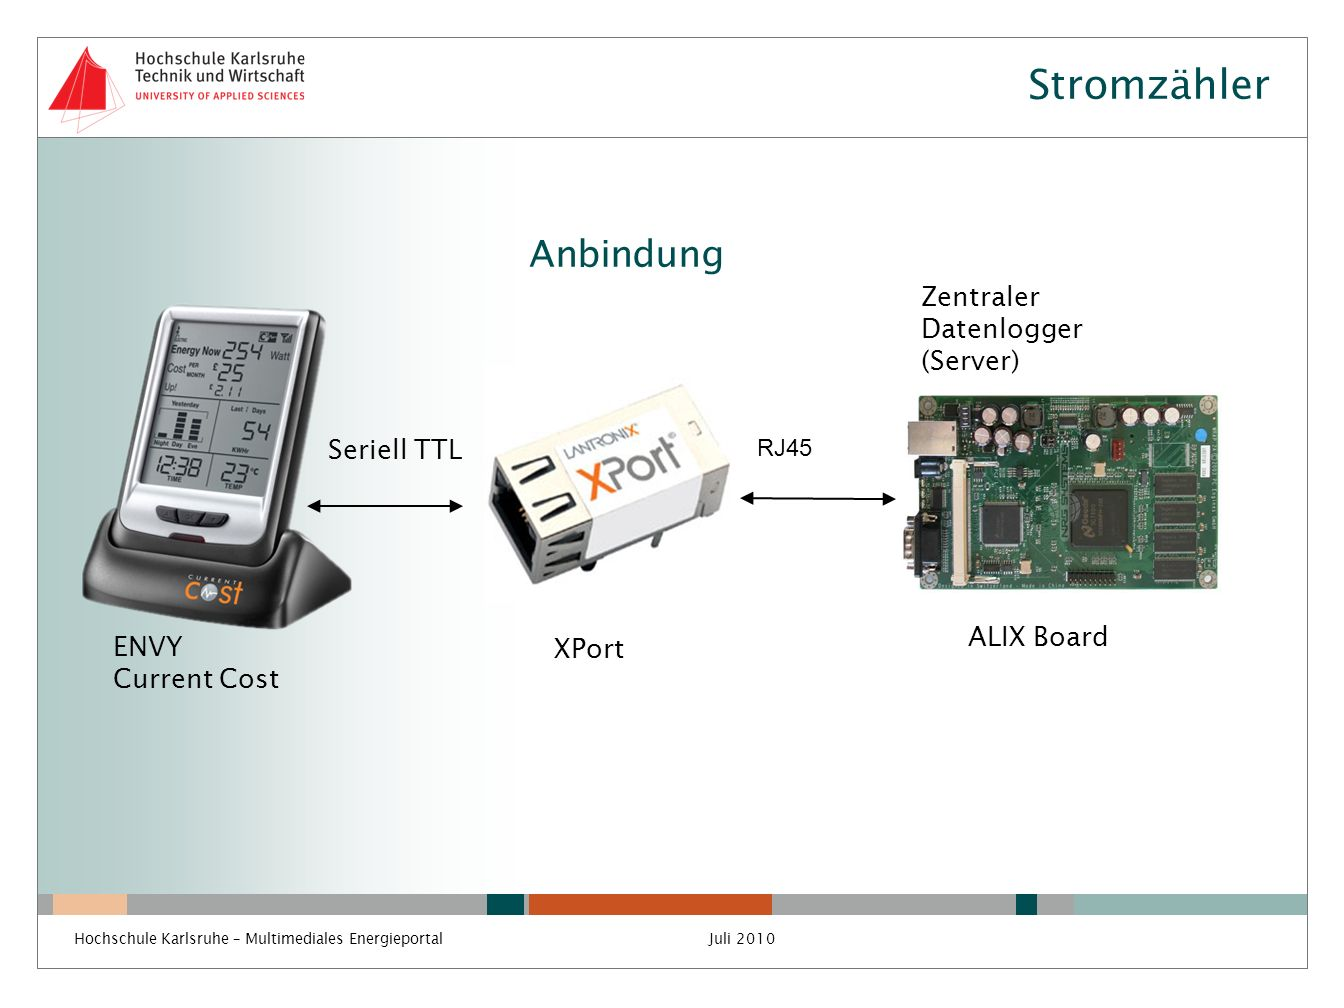 Stromzähler Anbindung ENVY Current Cost Seriell TTL RJ45 XPort Zentraler Datenlogger (Server) ALIX Board Hochschule Karlsruhe – Multimediales Energiep